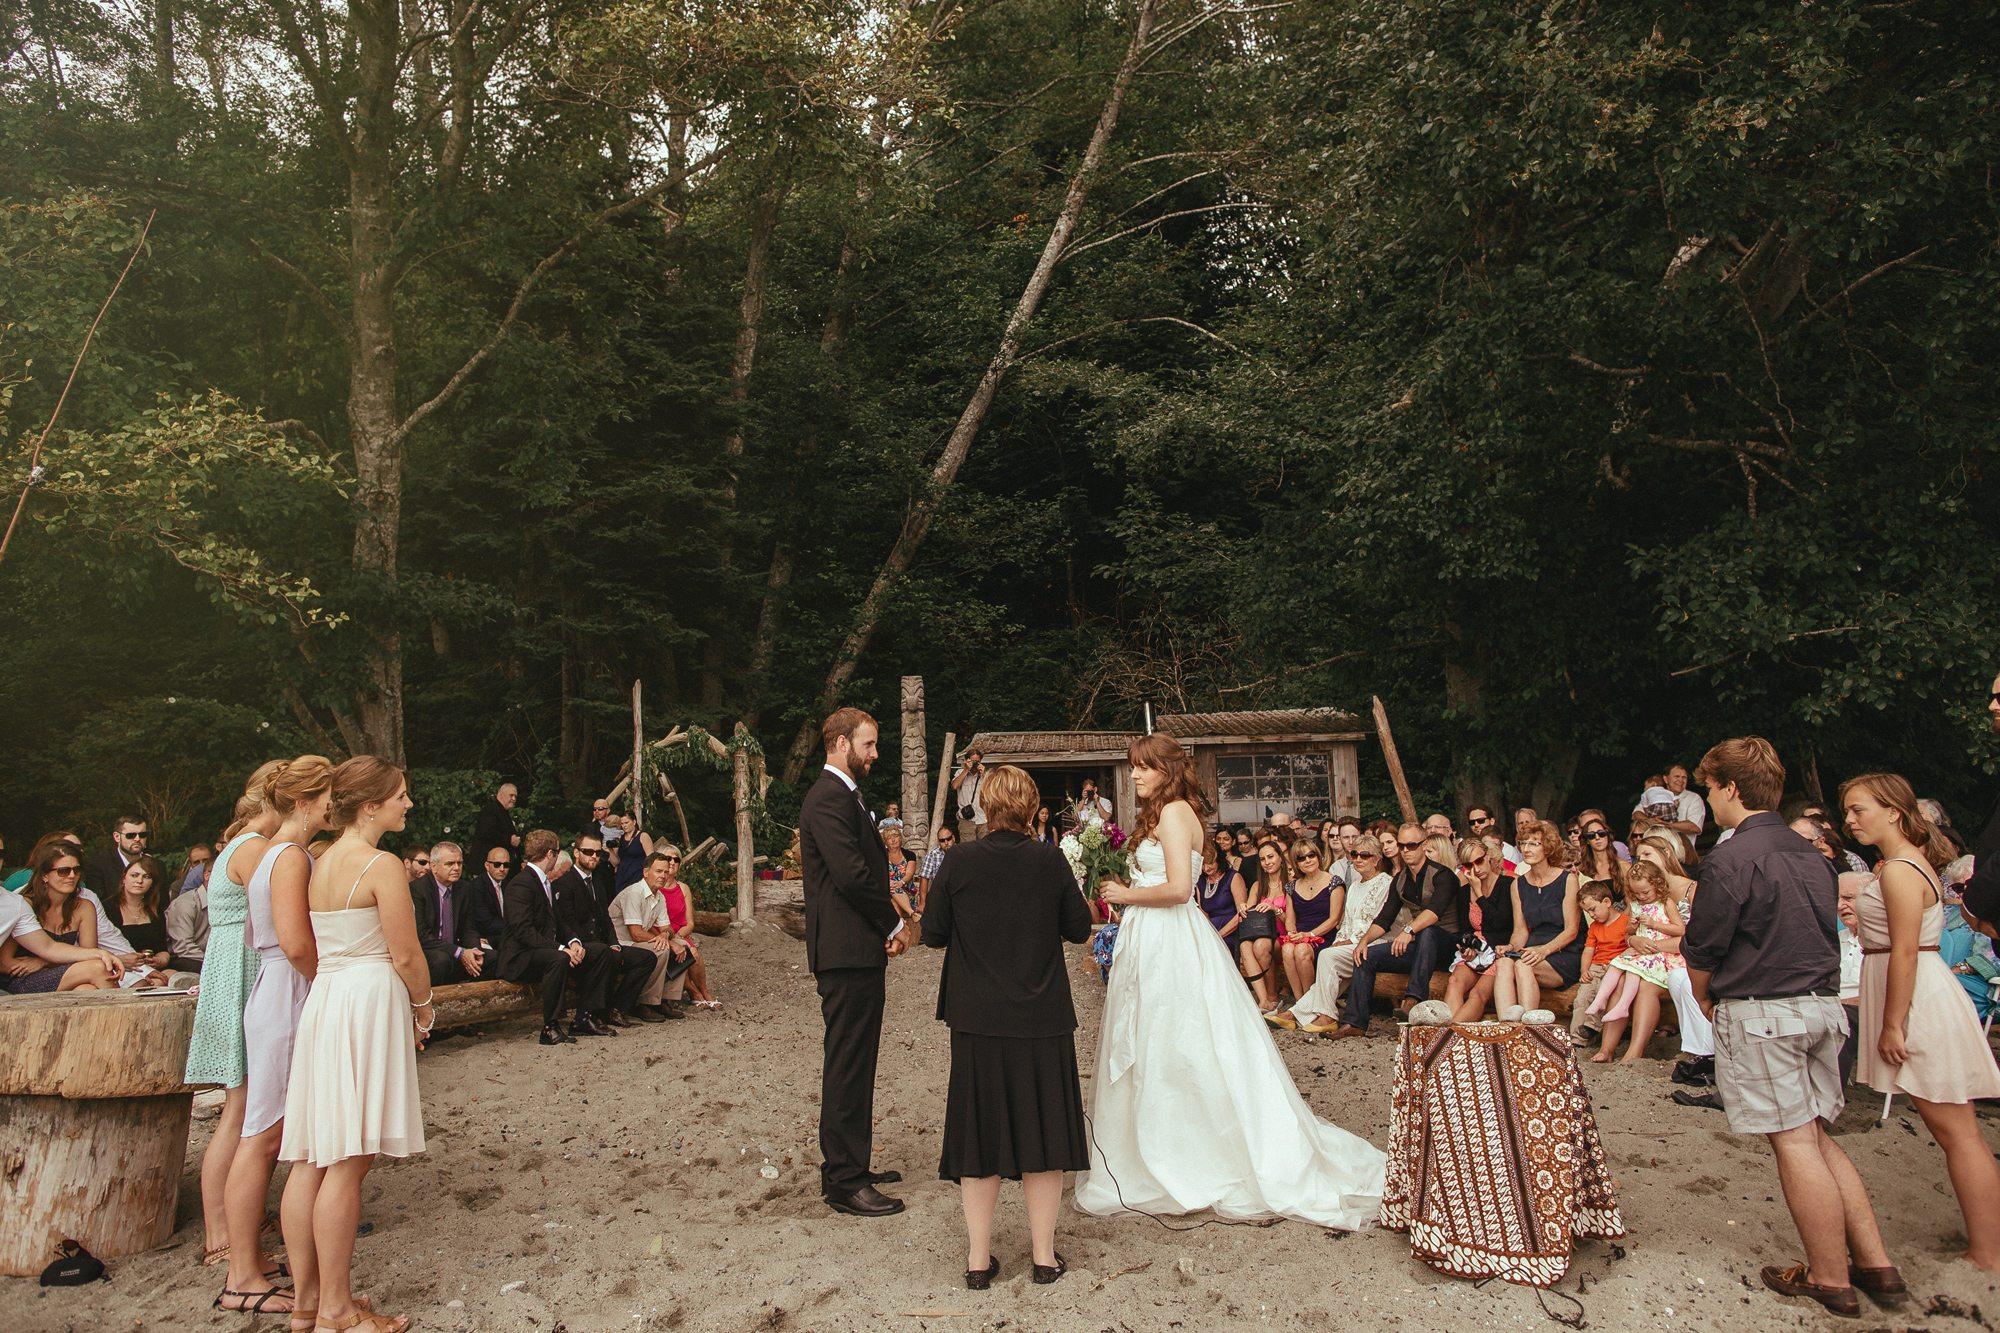 gibsons-wedding-photography-robert-devon22